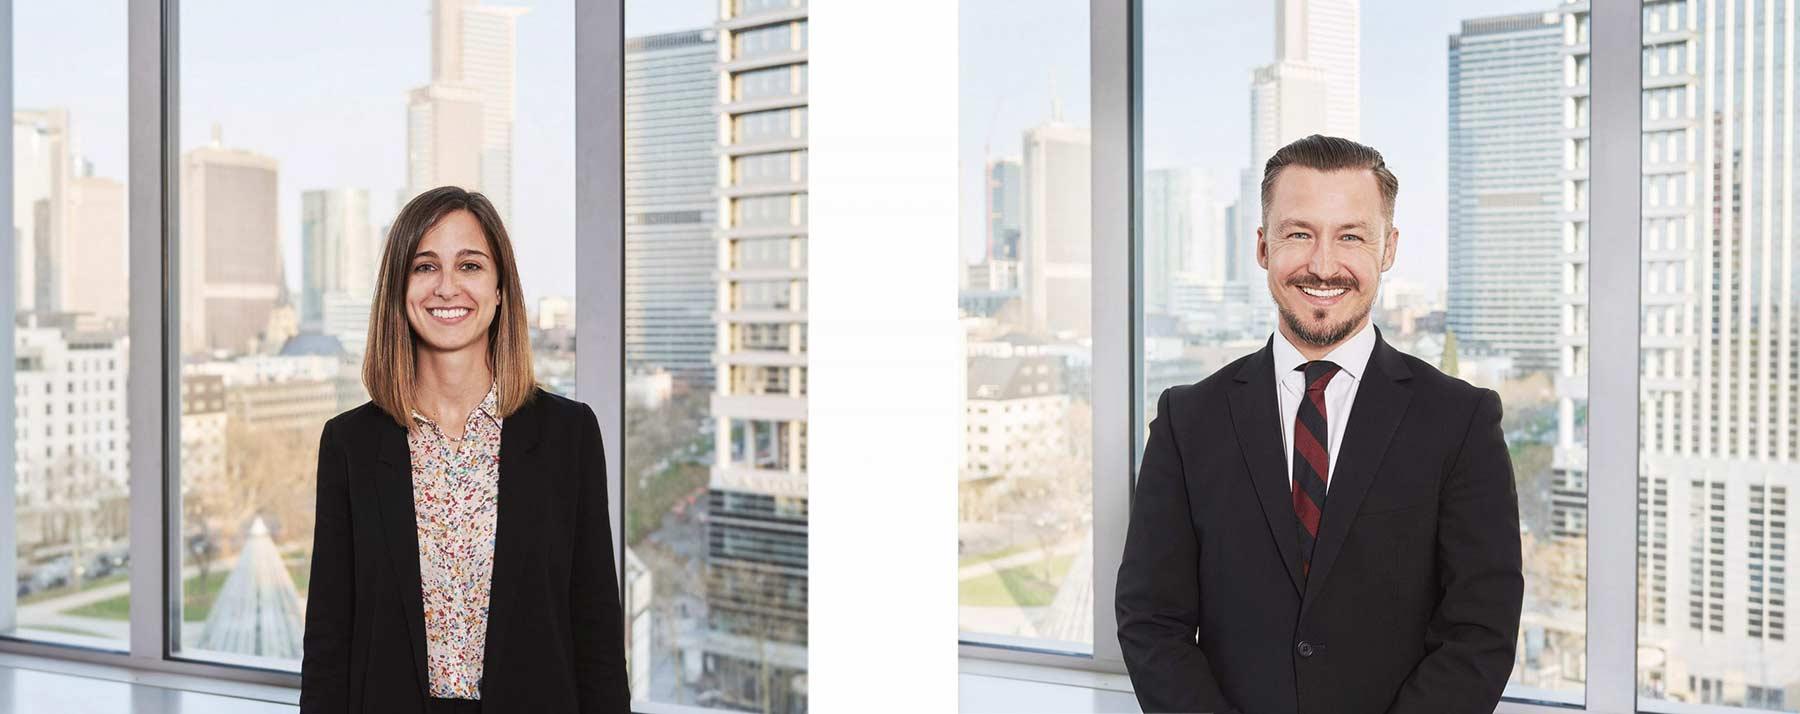 Business-Portraits-in-Frankfurt-am-Main